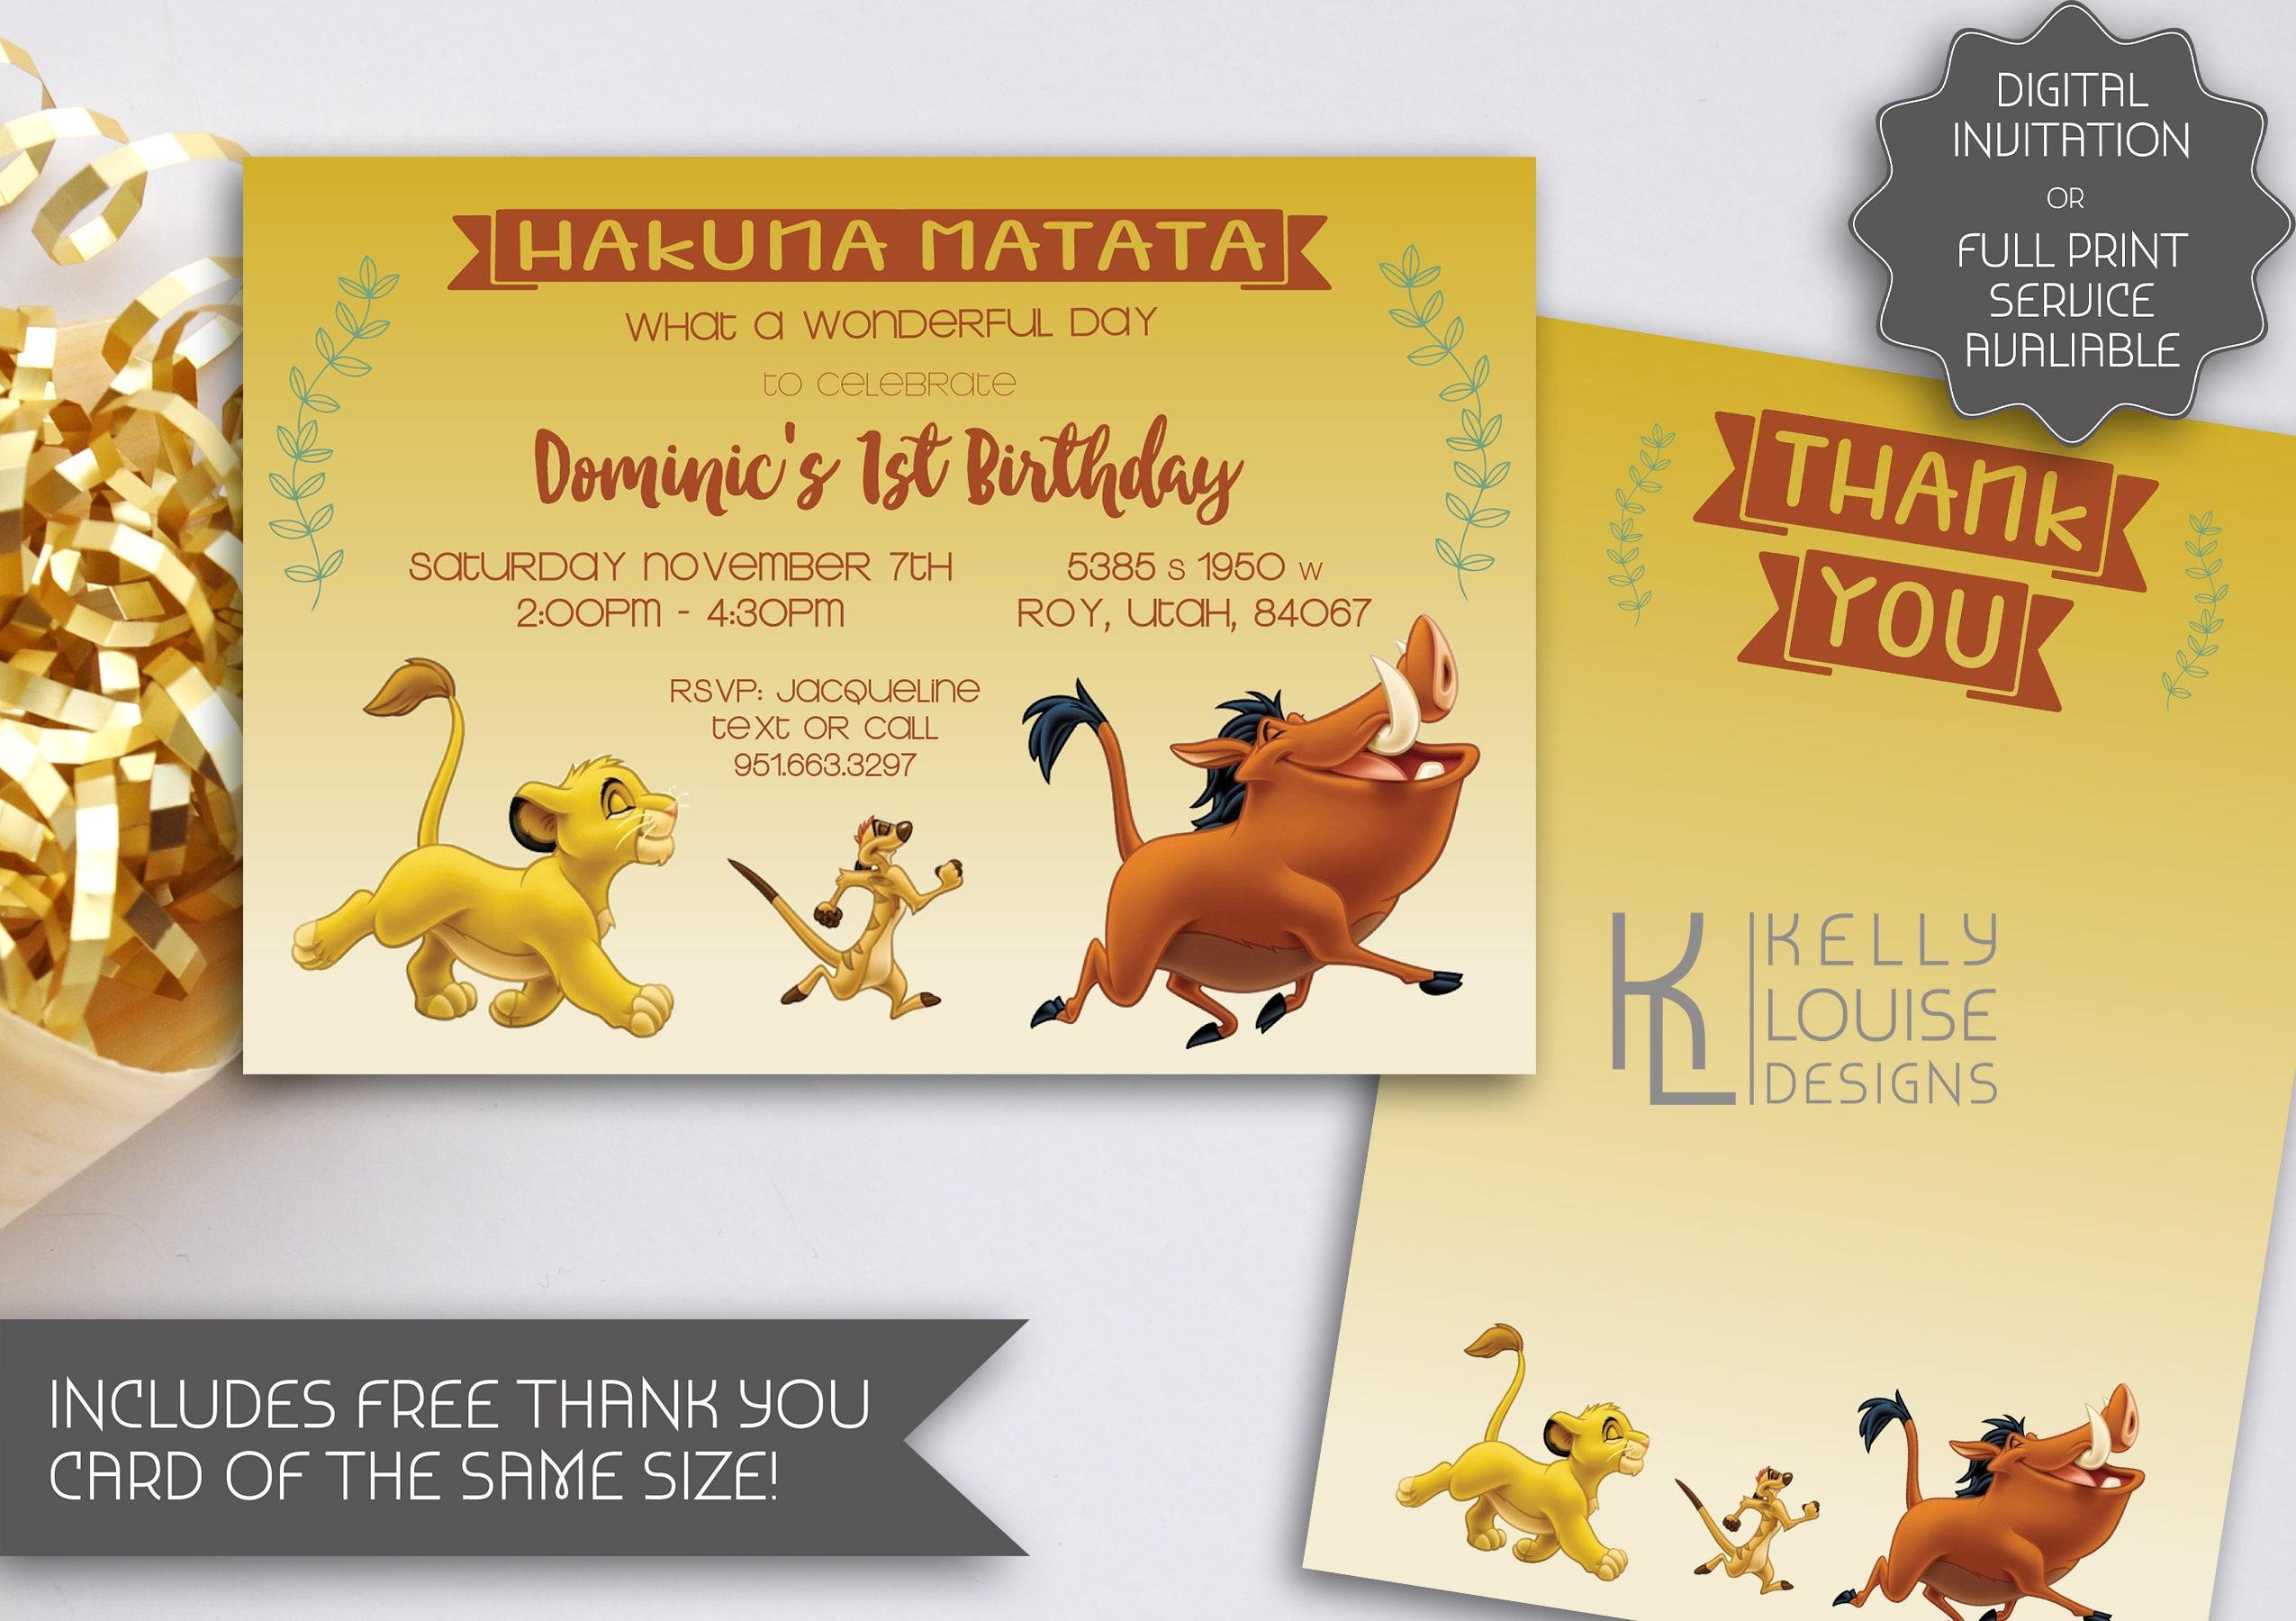 Lion king birthday invitation lion king digital invitation lion lion king birthday invitation lion king digital invitation lion king baby shower lion king party lion king printable invitation 074 filmwisefo